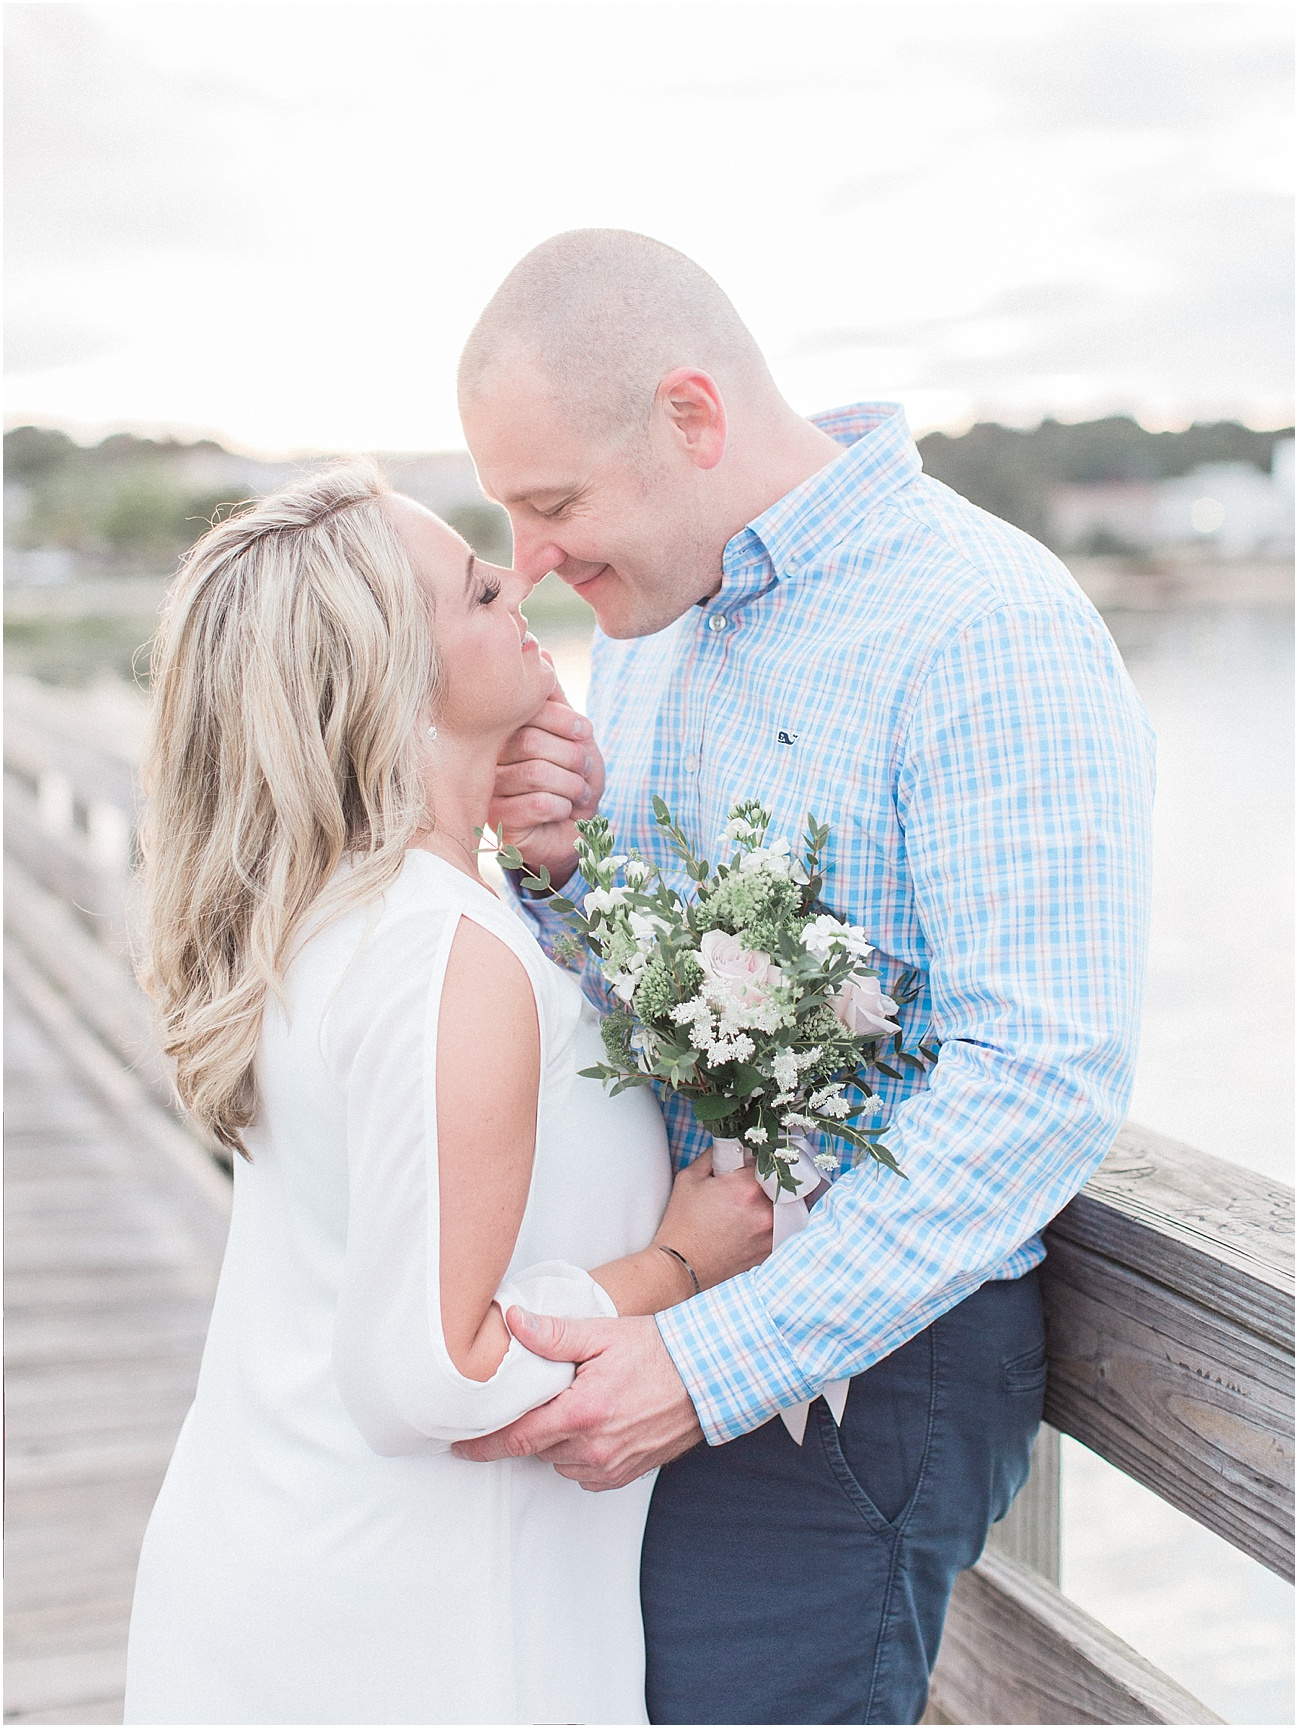 amy_erik_plymouth_brewster_gardens_jetty_champagne_cape_cod_boston_wedding_photographer_meredith_jane_photography_photo_0783.jpg